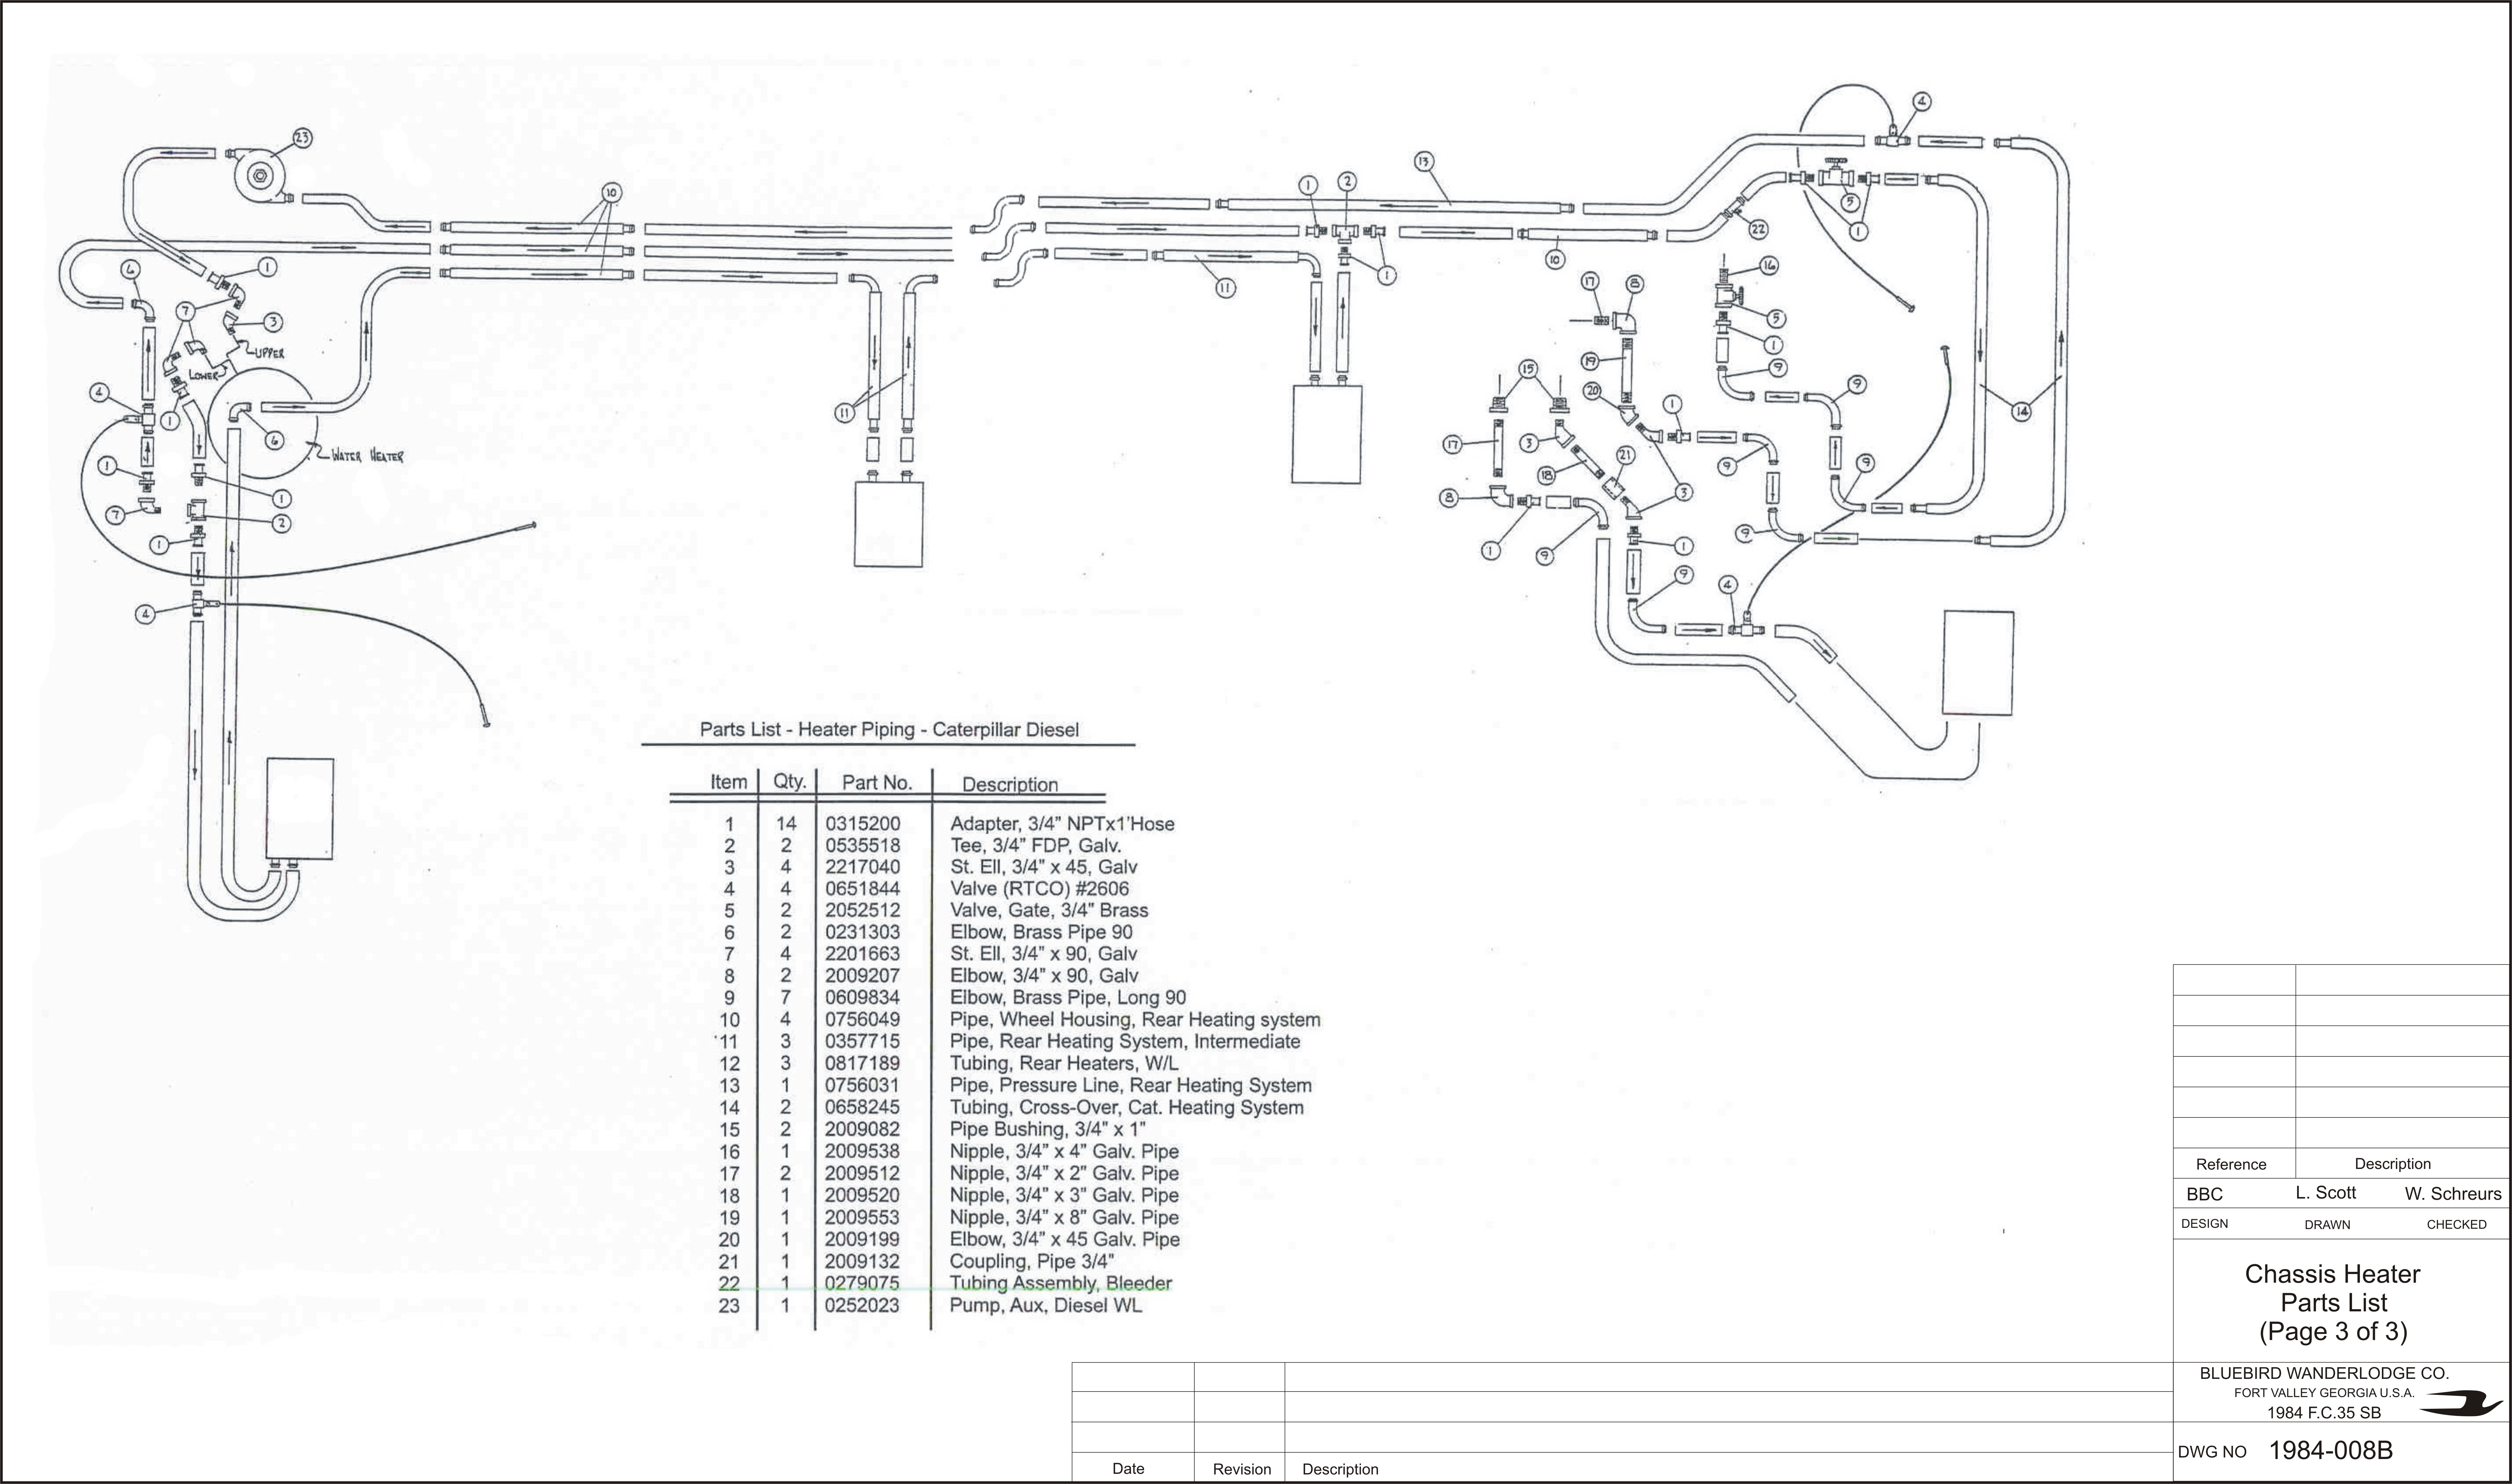 bluebird alternator wiring schematics trusted wiring diagrams u2022 rh weneedradio org bluebird bus wiring schematics One Wire Alternator Wiring Diagram